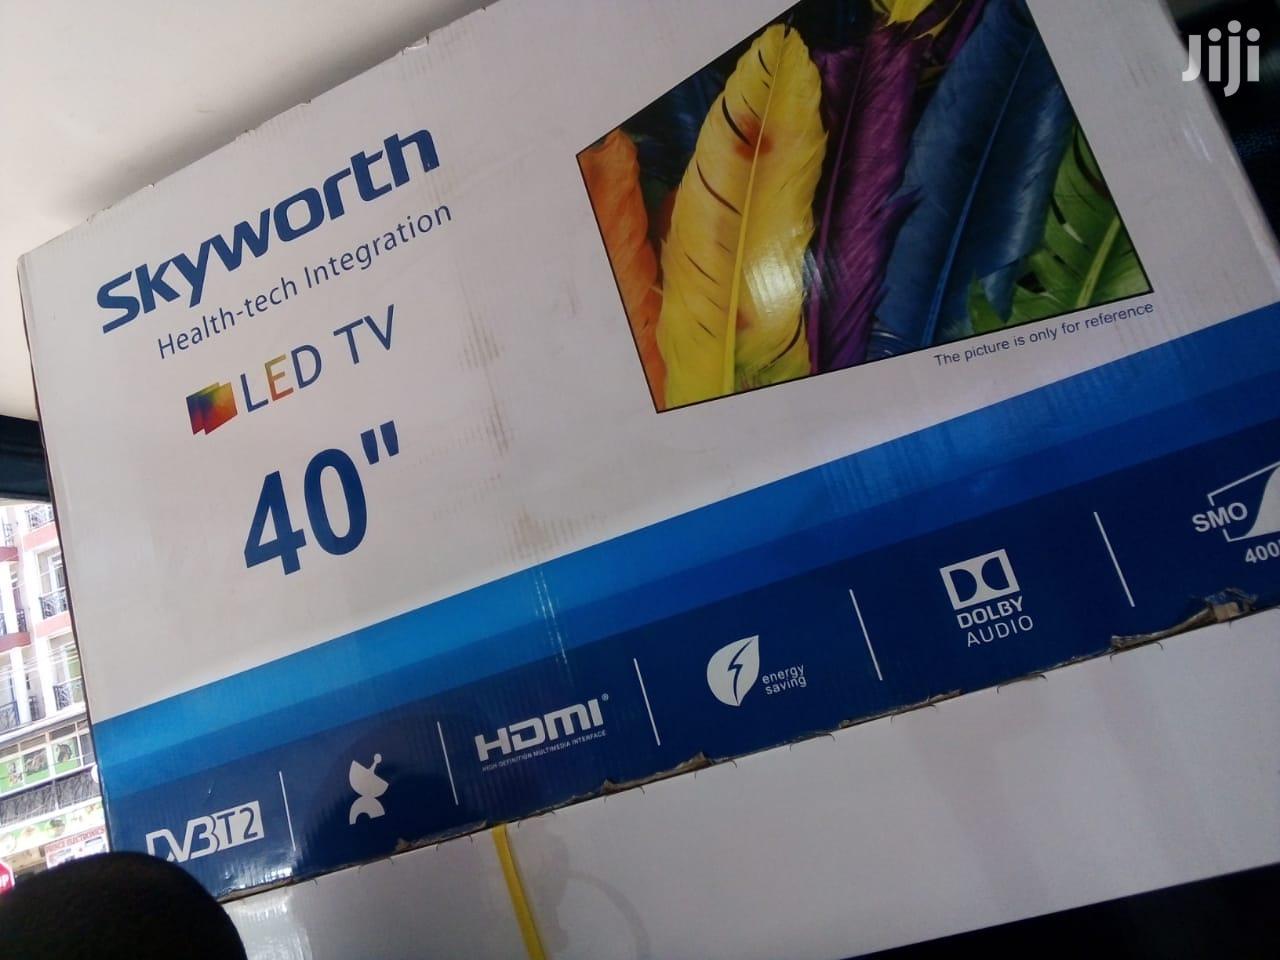 Skyworth 40 Inch LED Digital Tv